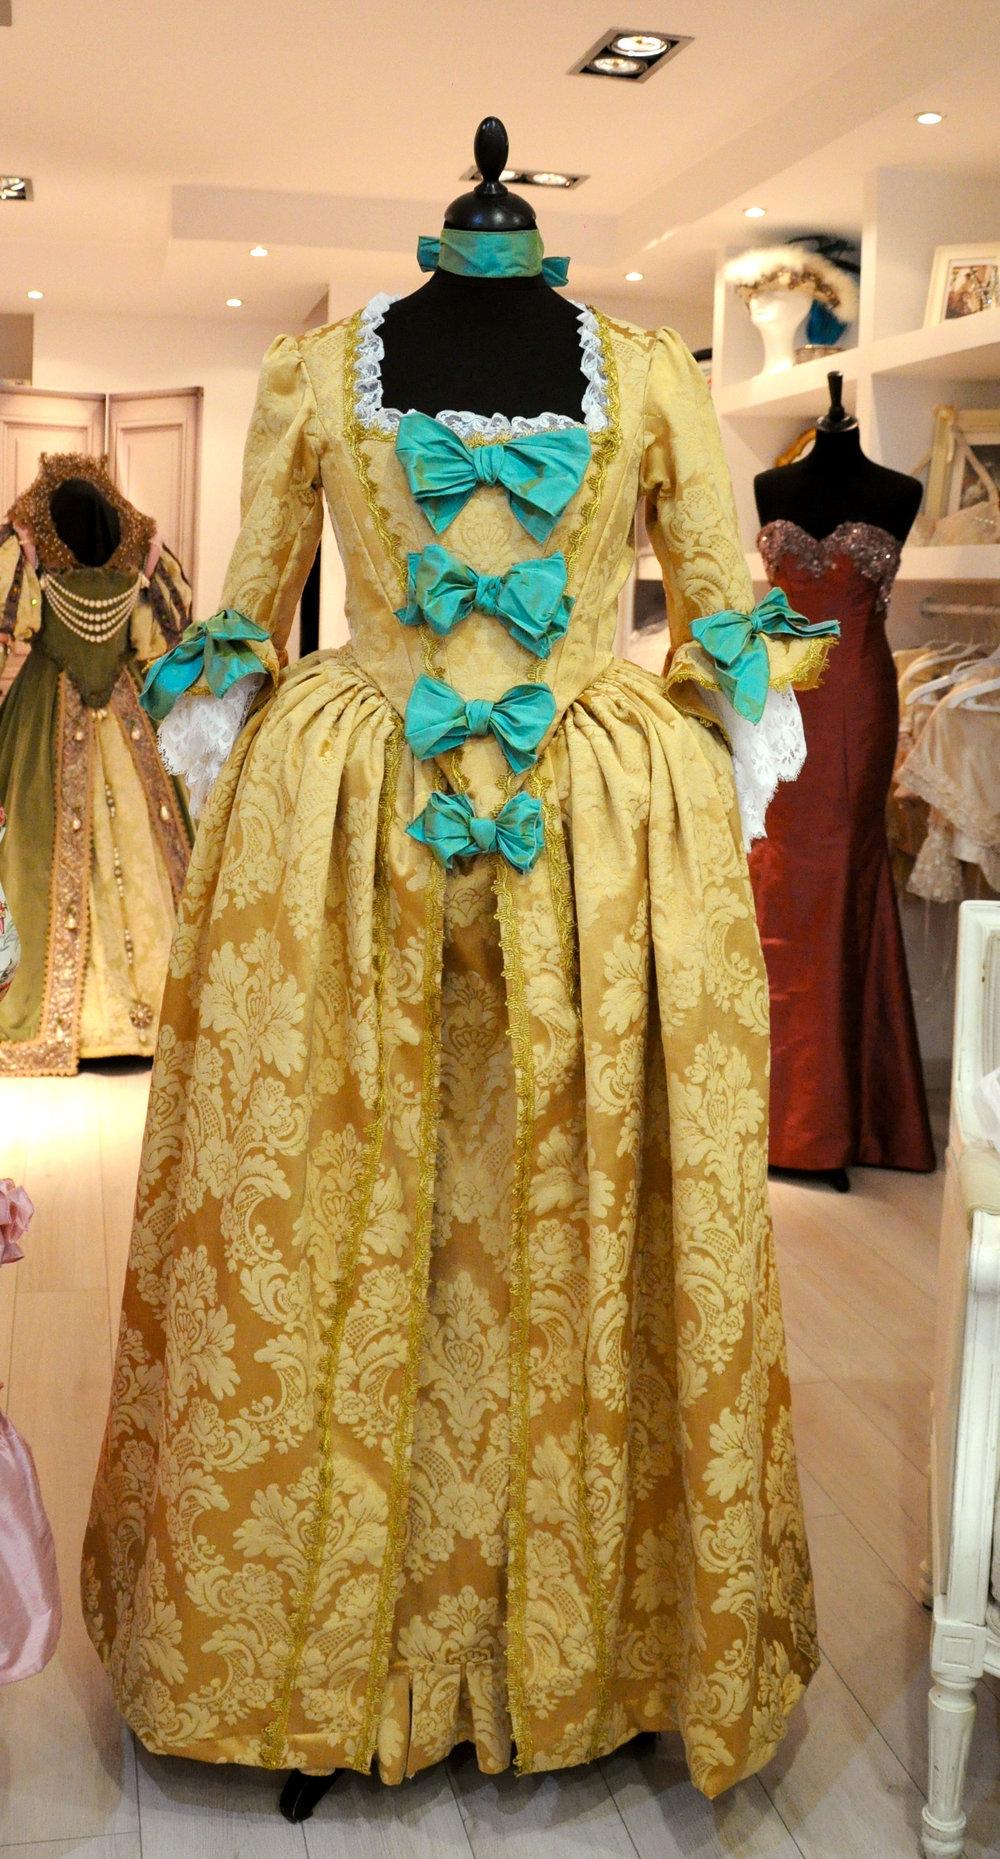 Robe XVIIIe dorée Agnès Szabelewski.jpg